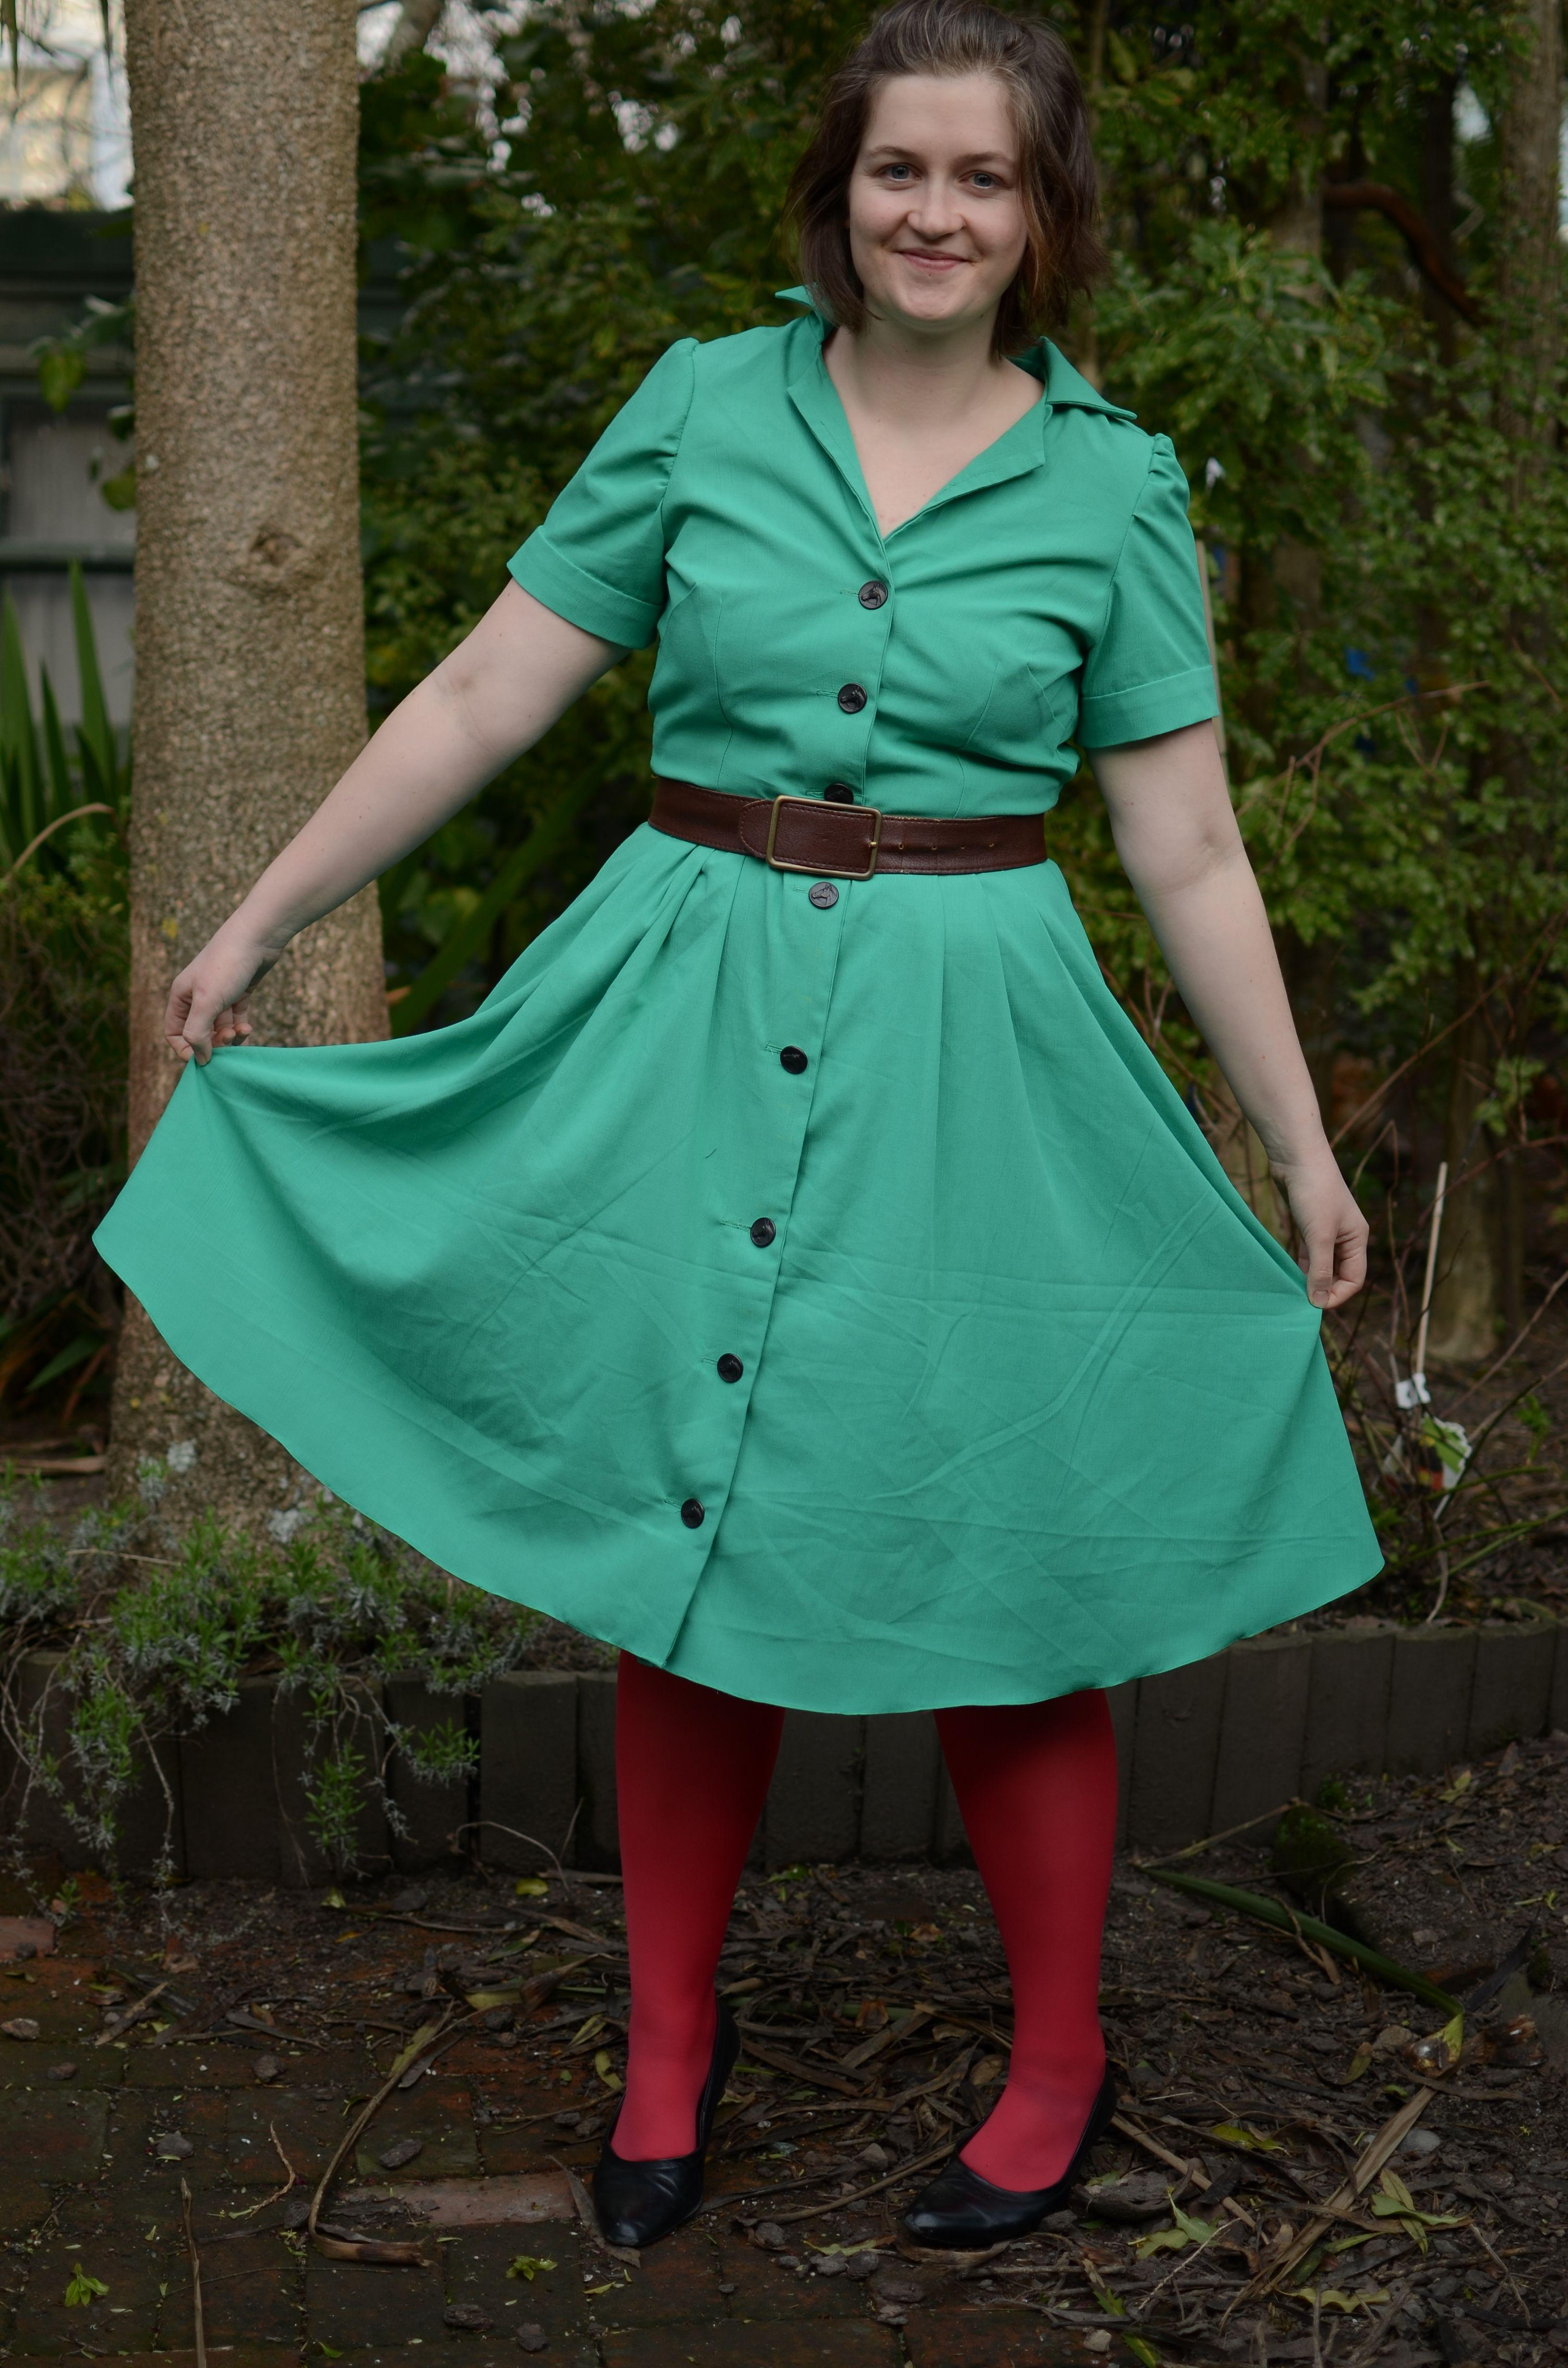 Gertie shirtwaist dress in Palomino green